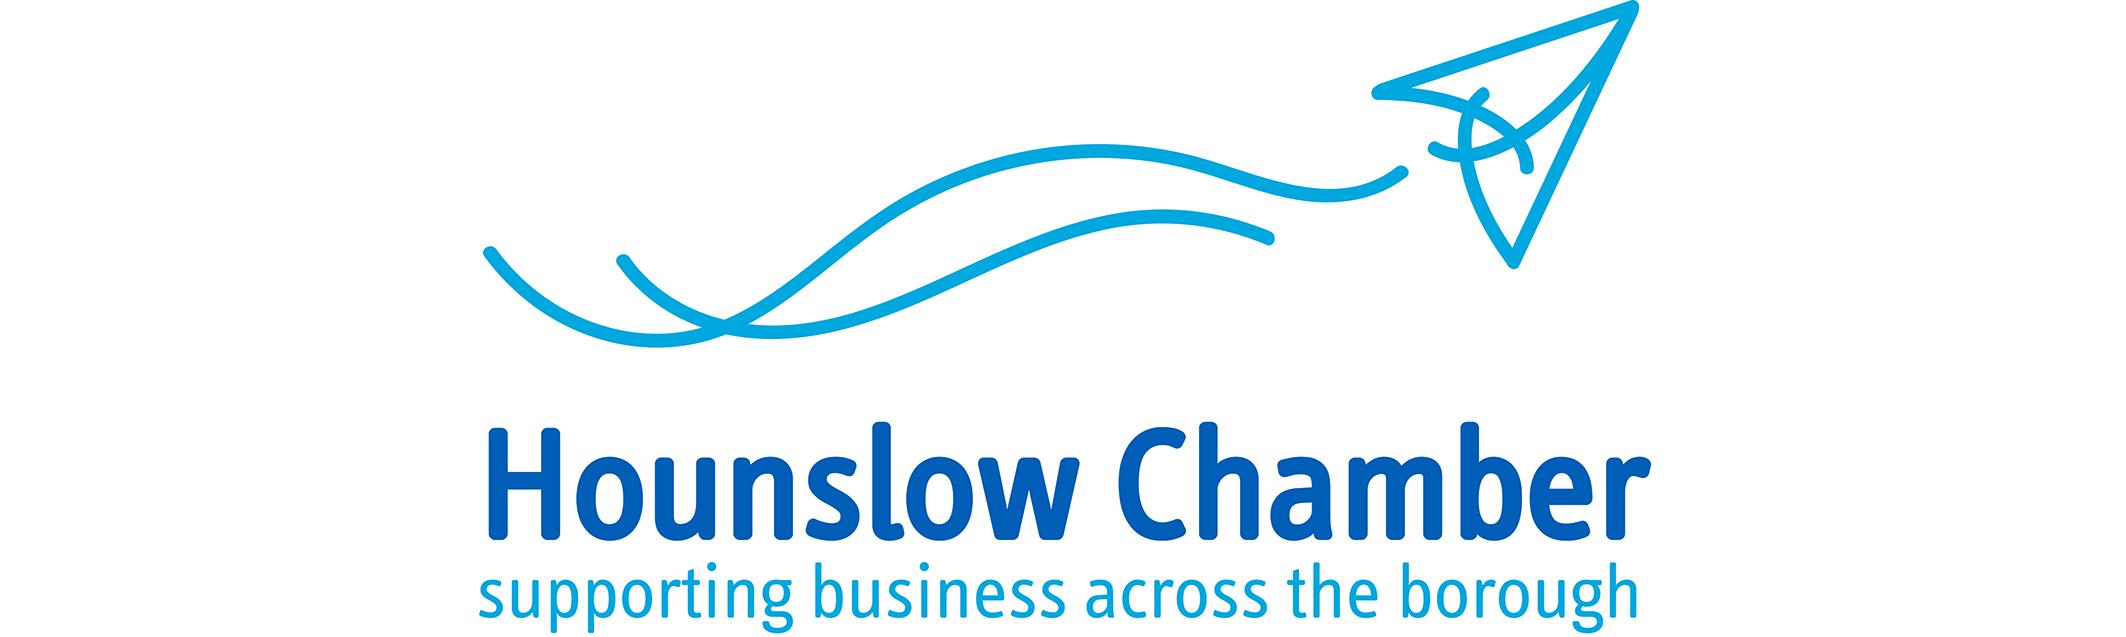 Hounslow Chamber of Commerce -